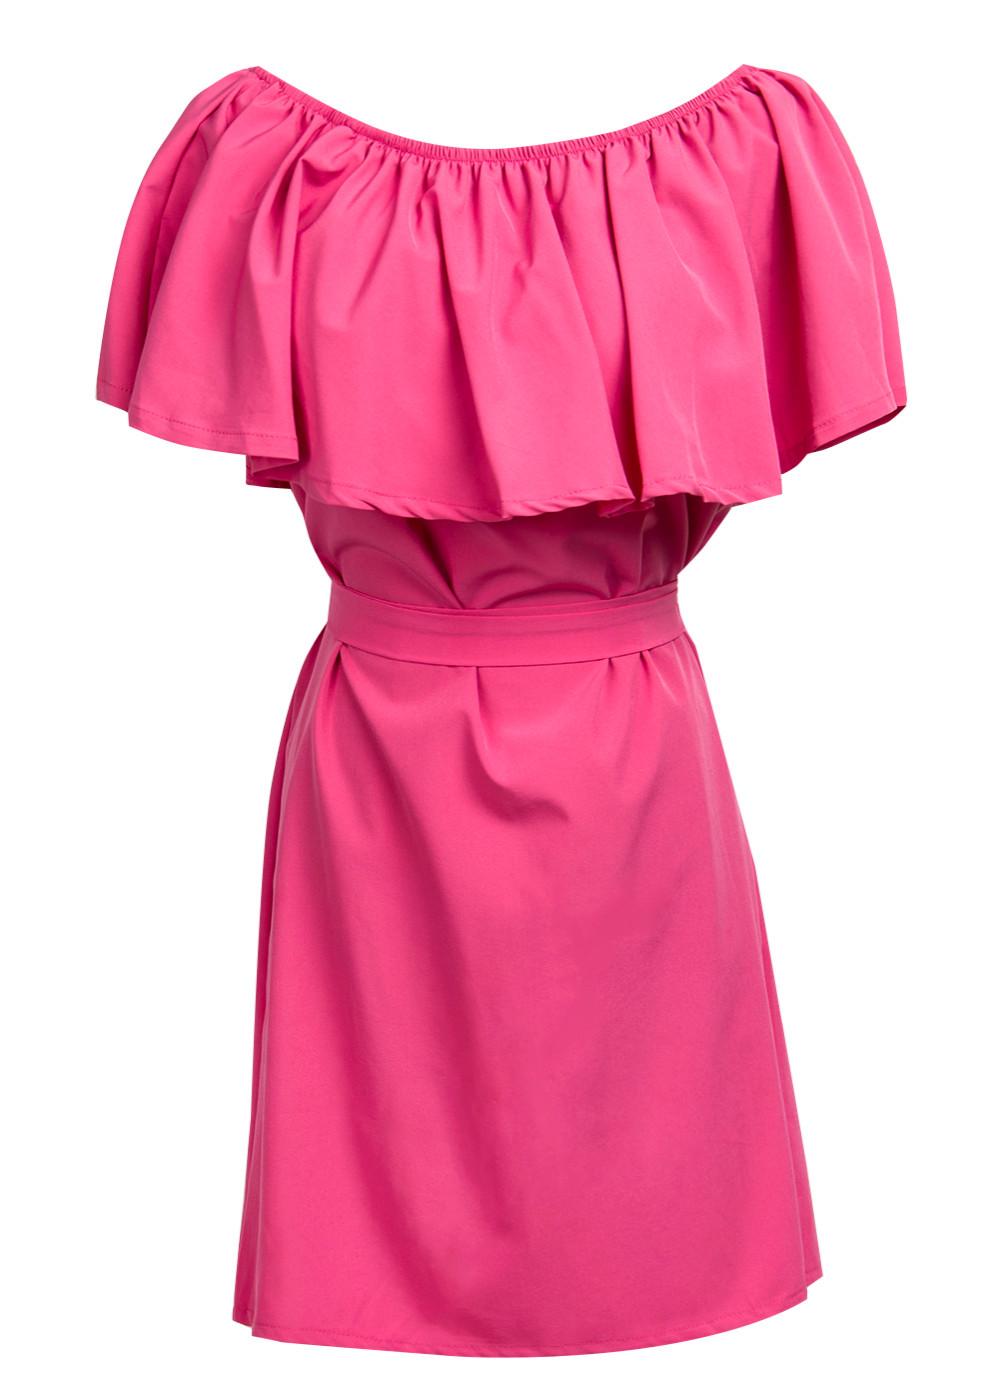 Fashion Brand Vestidos Summer Dress Women Off Shoulder Dress Sleeveless Ruffles Cross Straps Dresses Candy Color Party Dresses